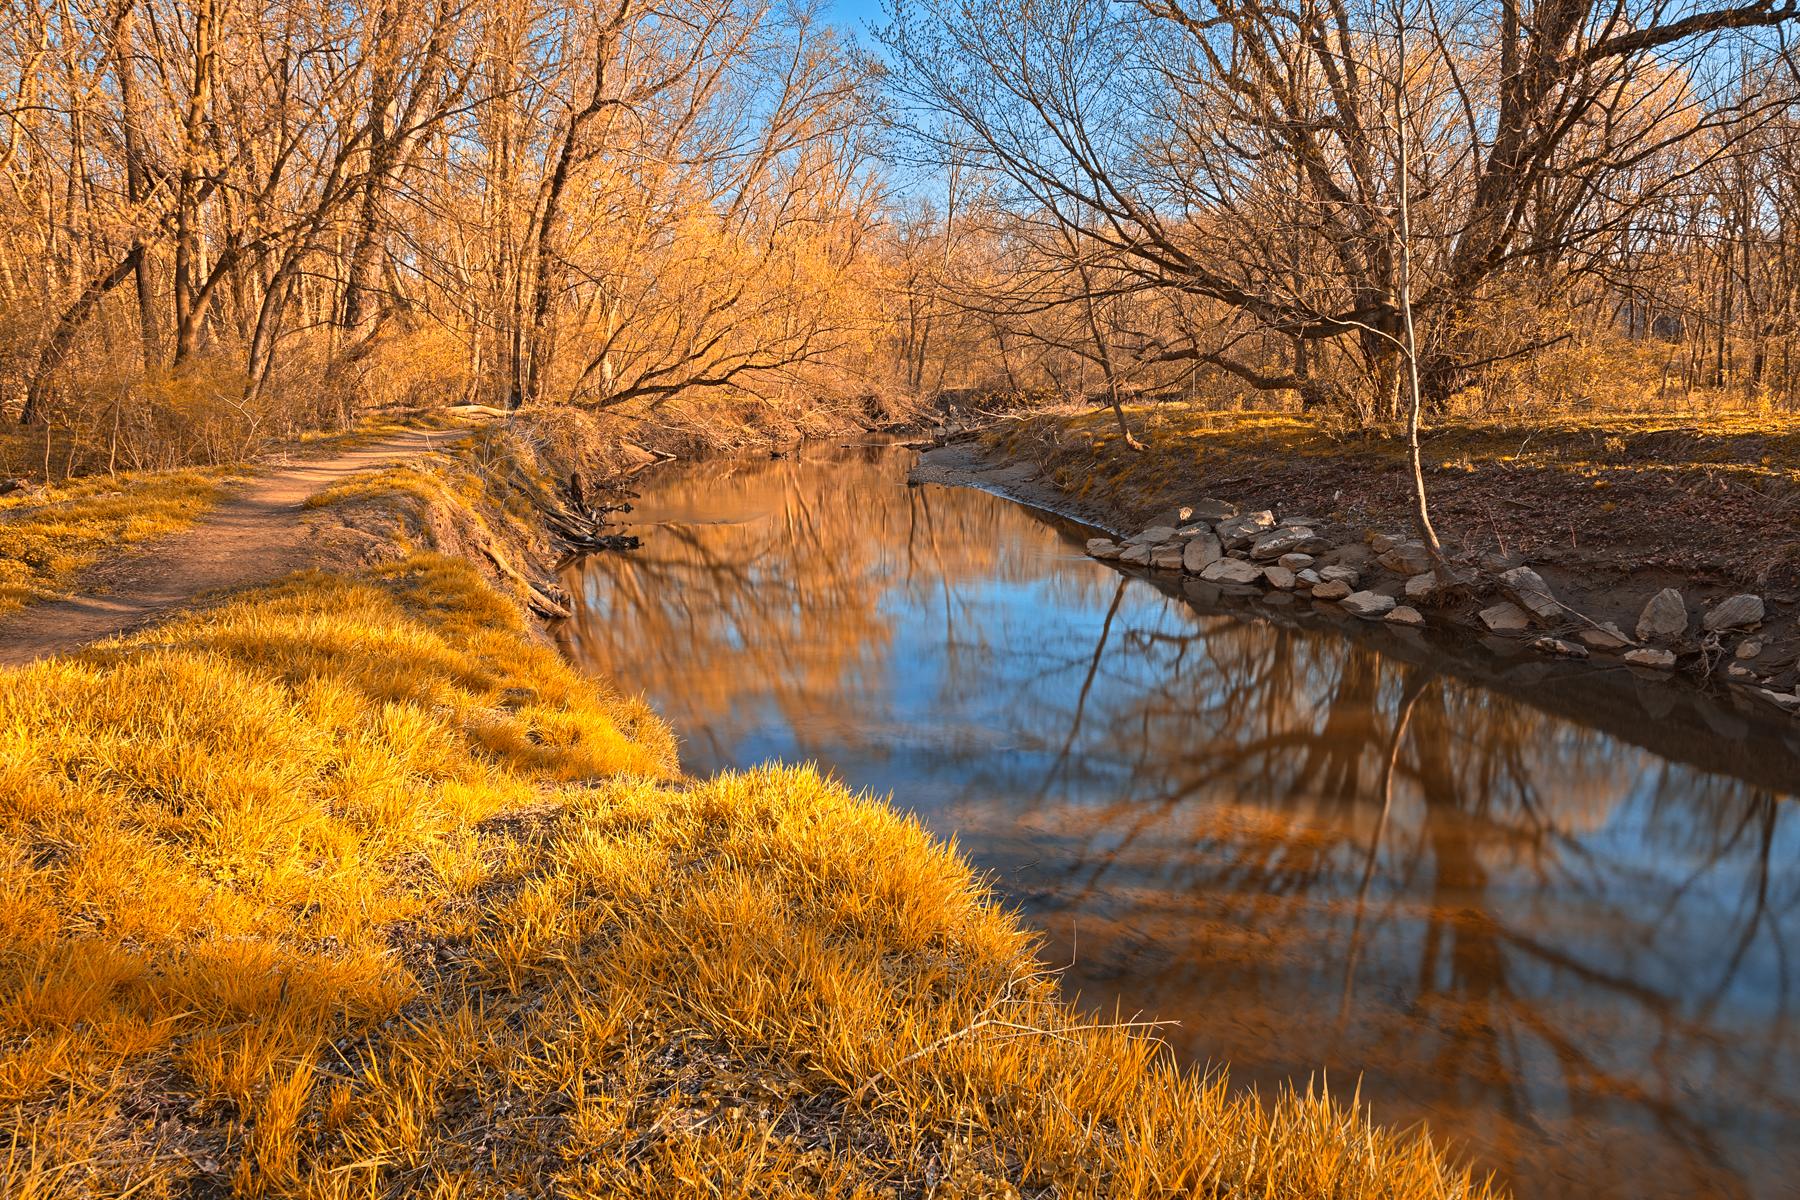 Gold Rock Creek - HDR, America, Rocks, States, Somadjinn, HQ Photo